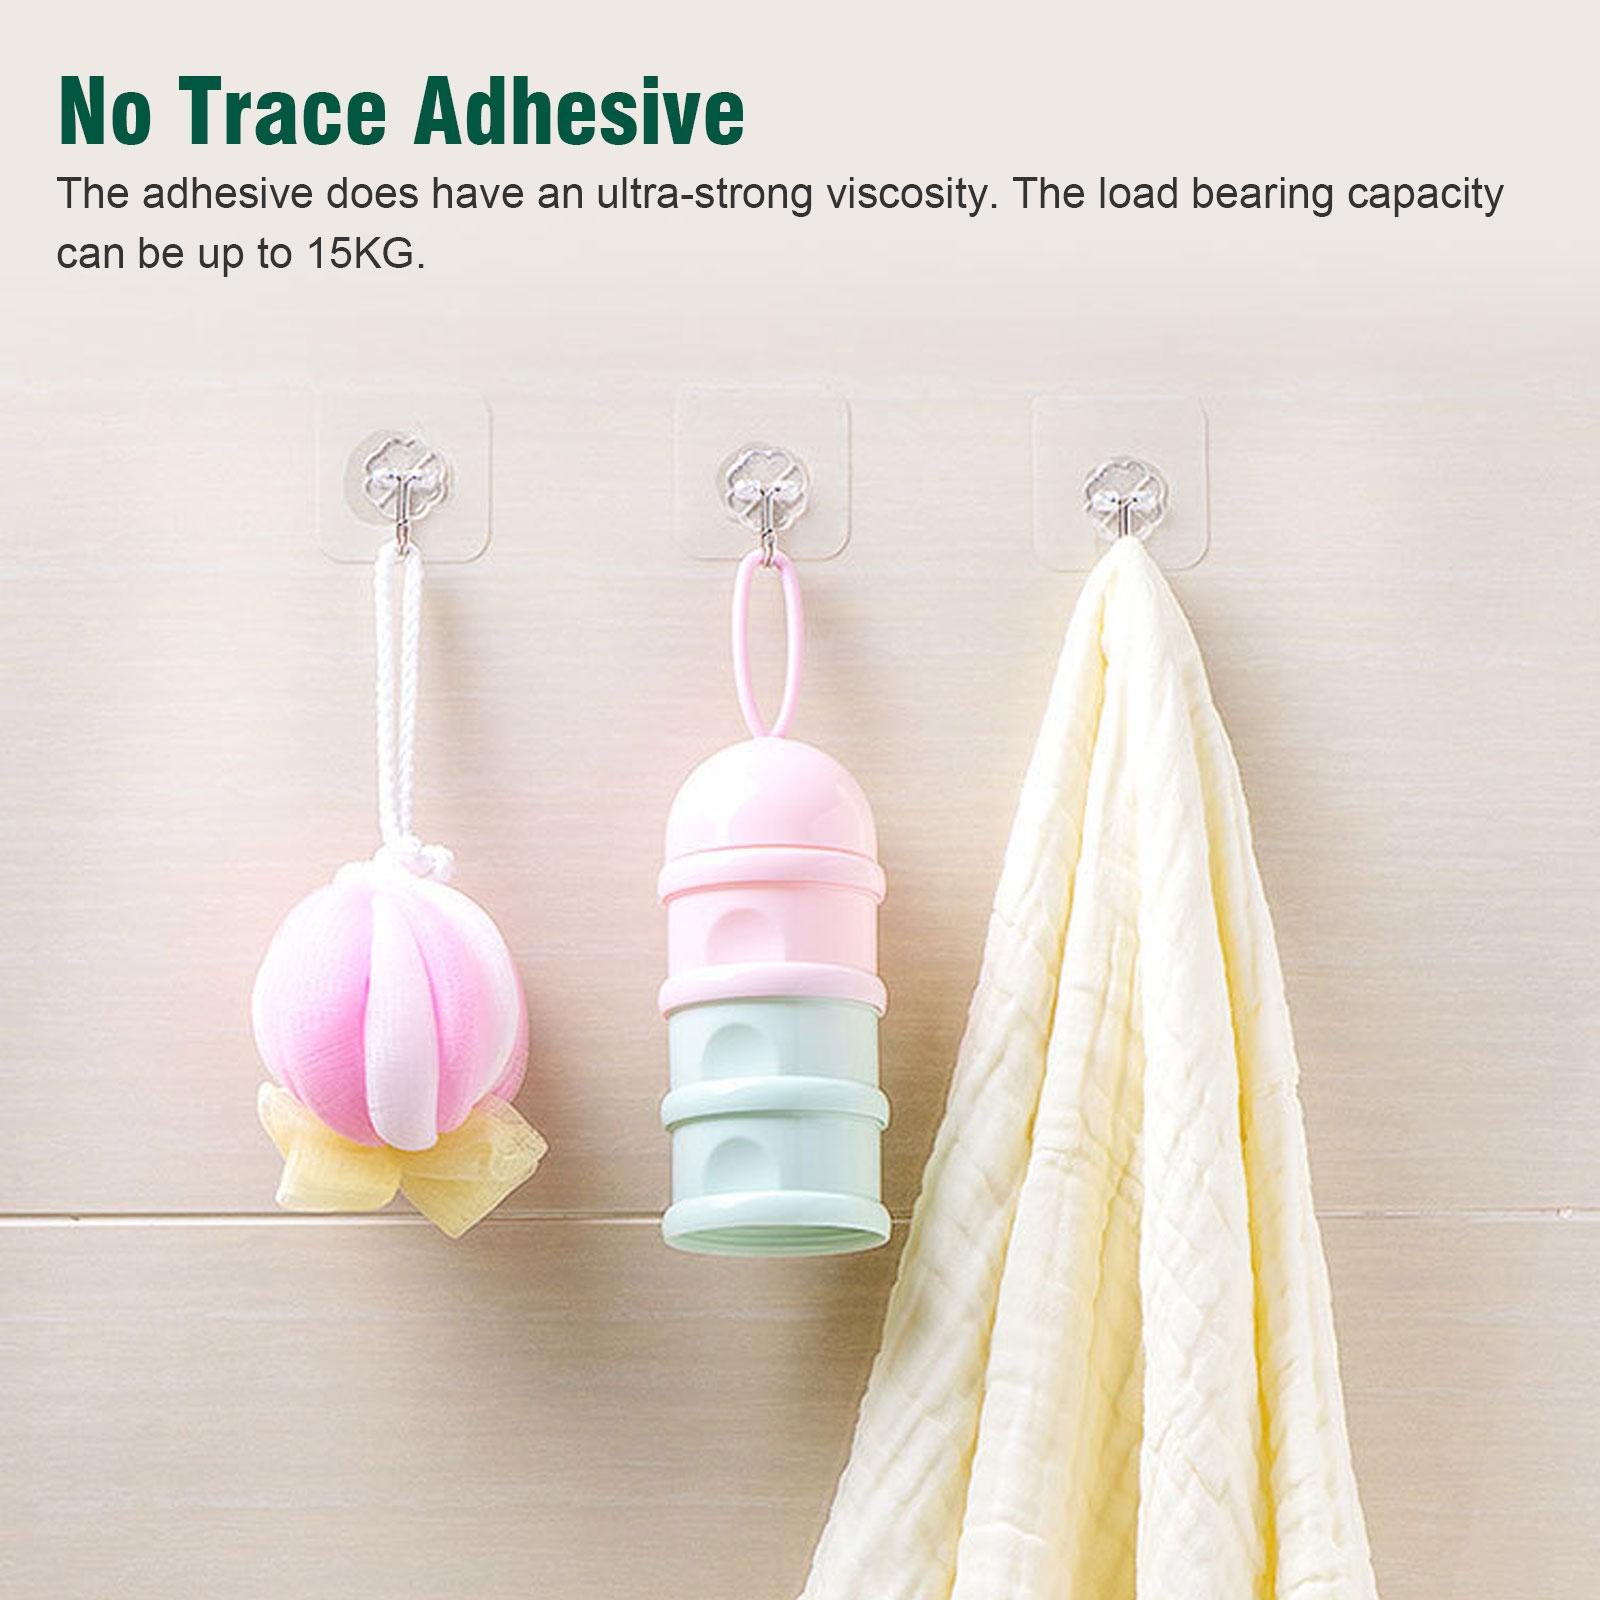 20-40x-Adhesive-Sticky-Hooks-Heavy-Duty-Wall-Seamless-Hooks-Hangers-Transparent thumbnail 2